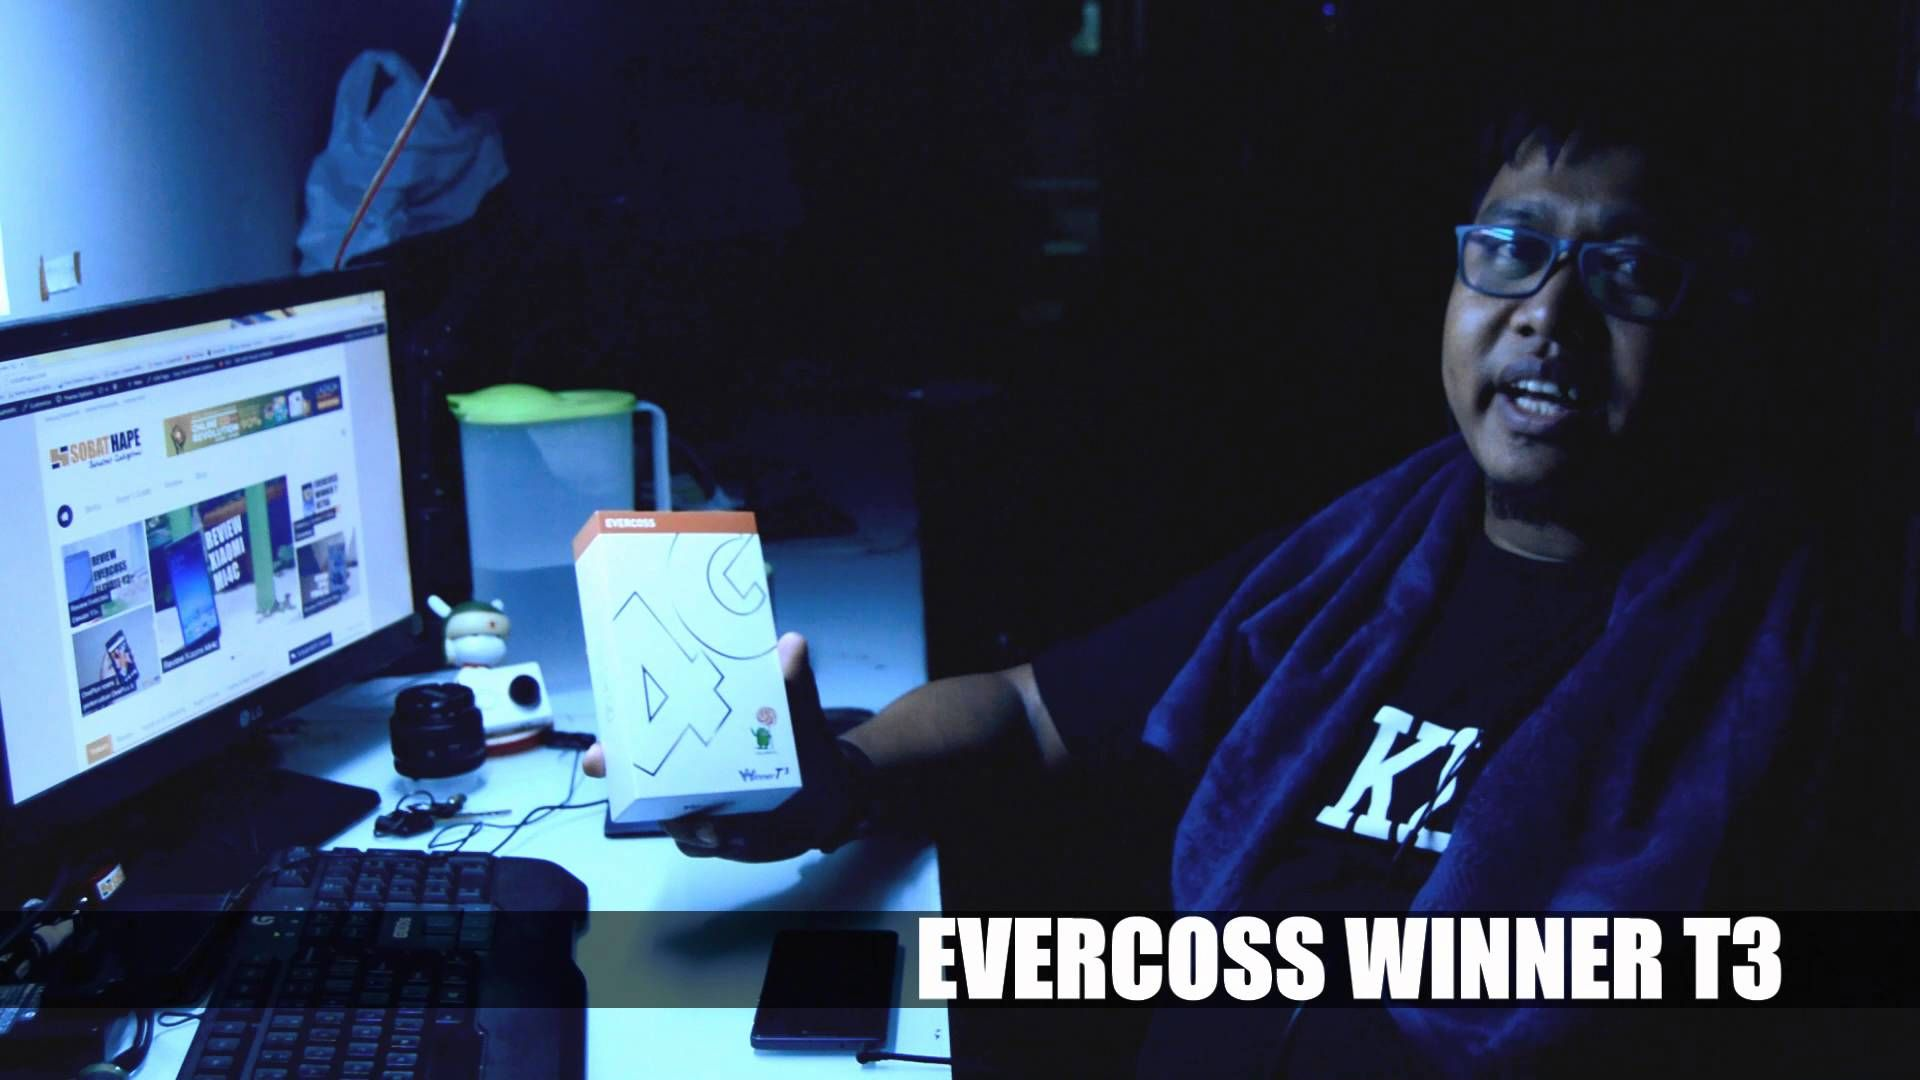 Giveaway Evercoss Winner T3 (Kenalan Sama IkeIkeKimochi)